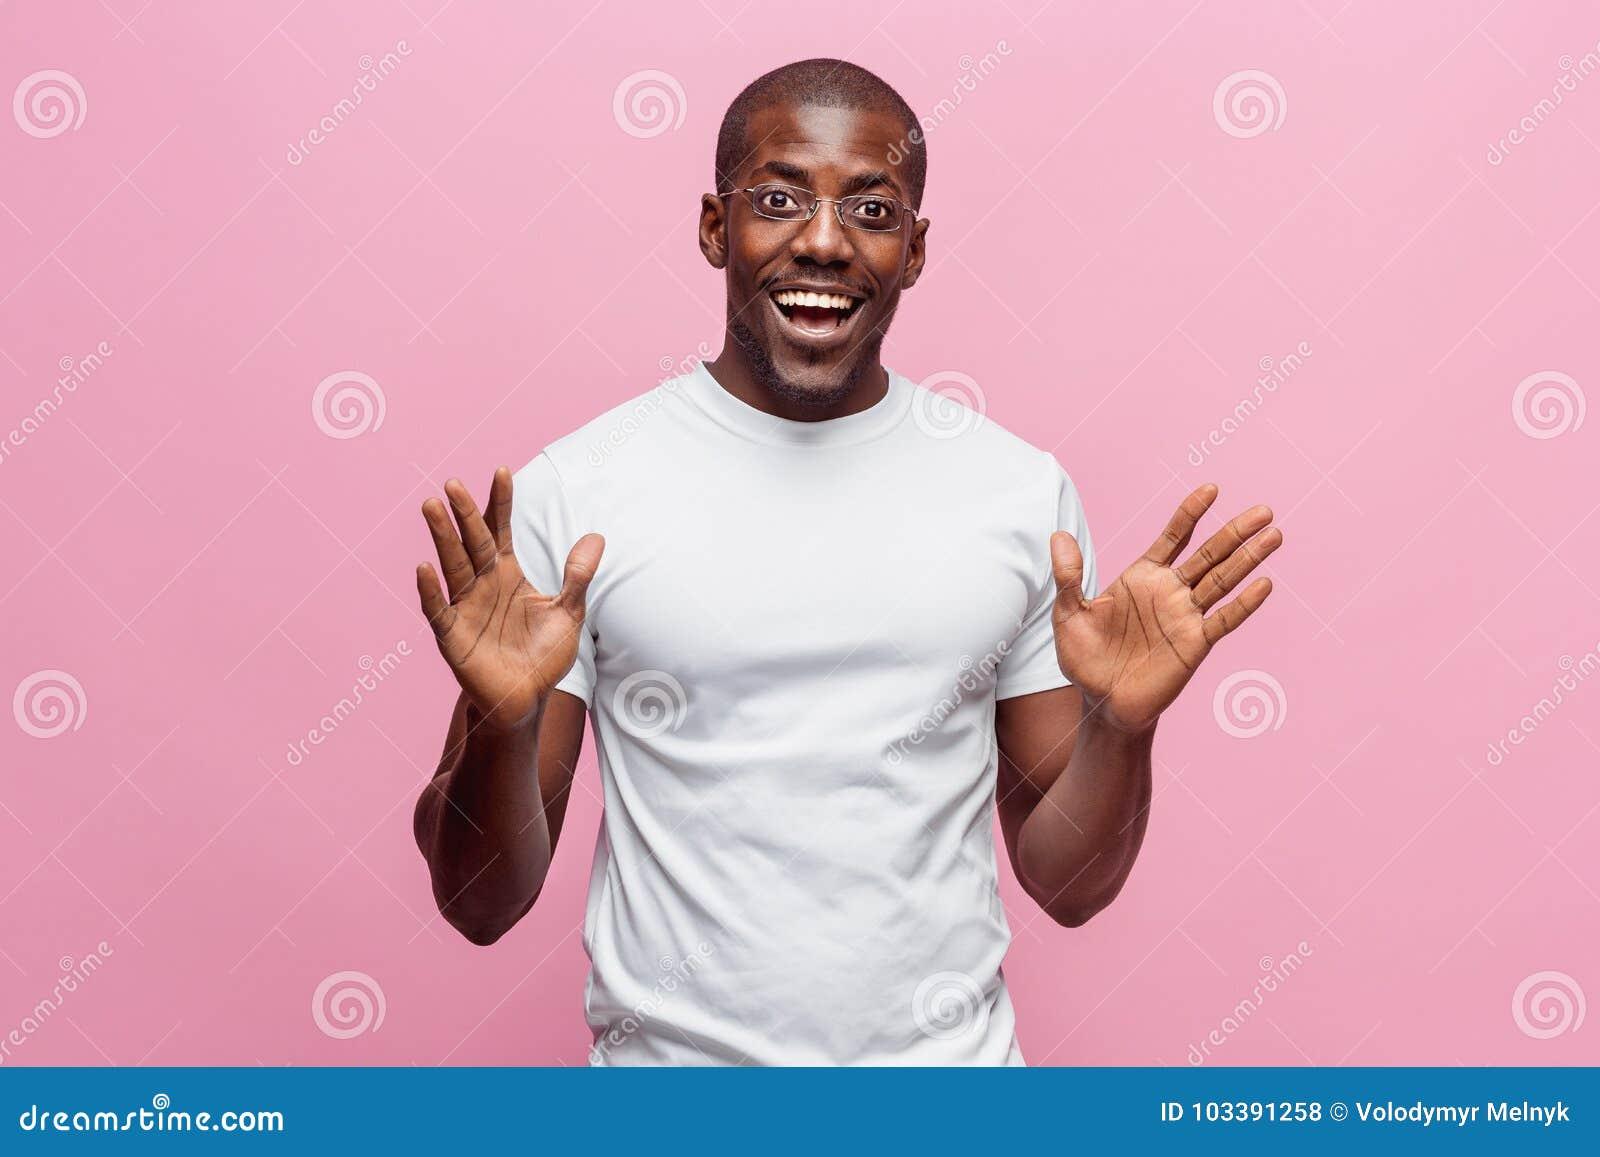 Happy black american man